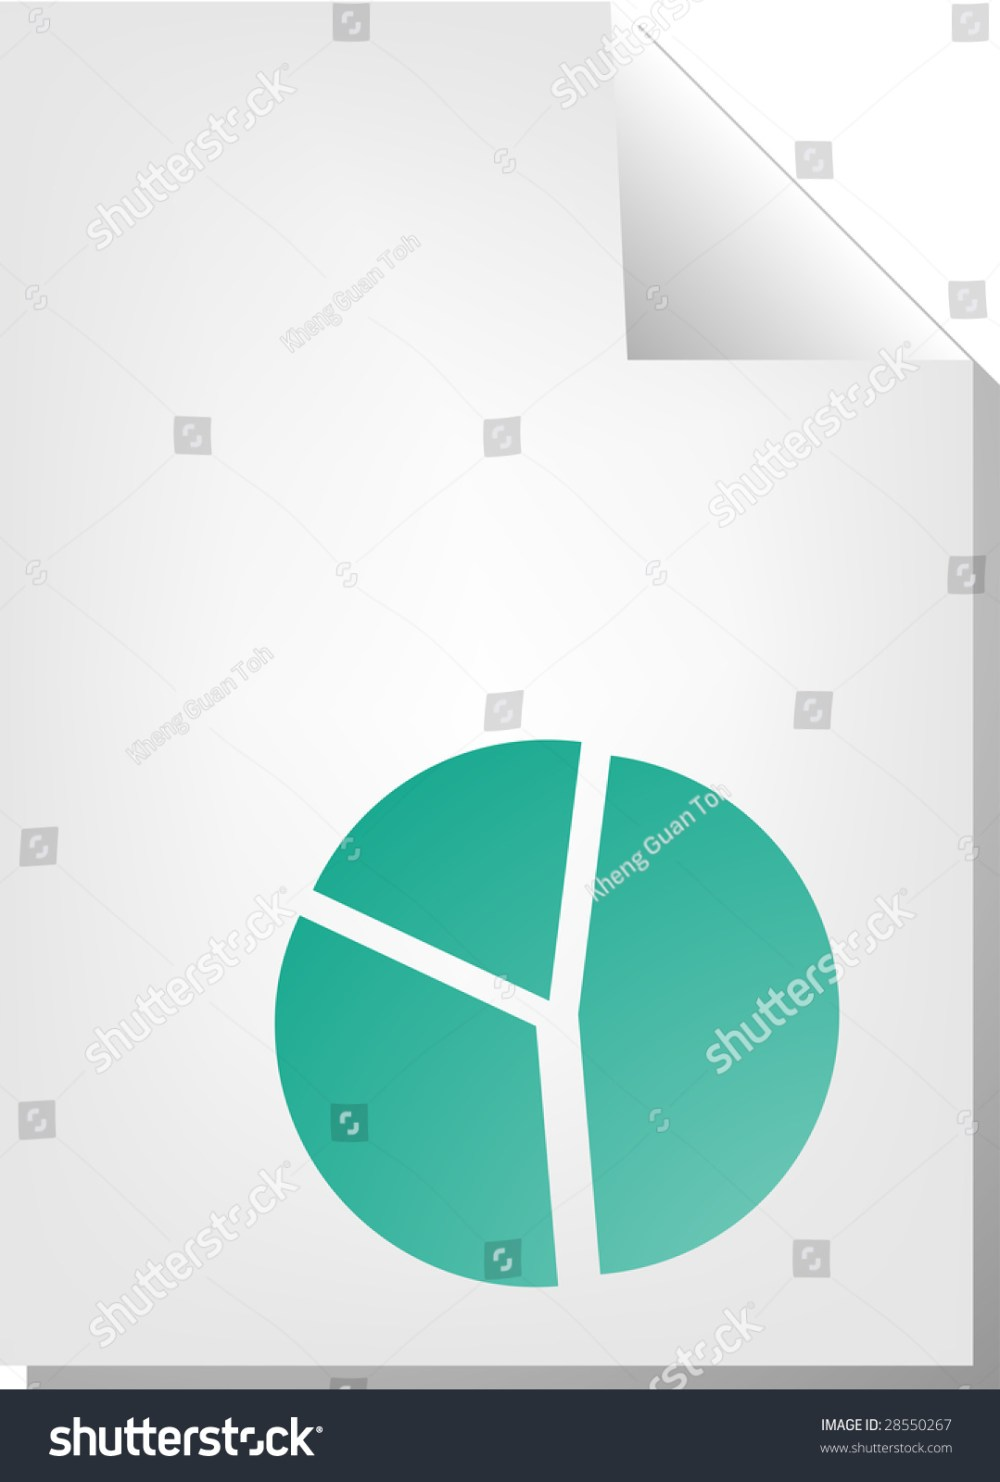 medium resolution of pie chart document file type illustration clipart